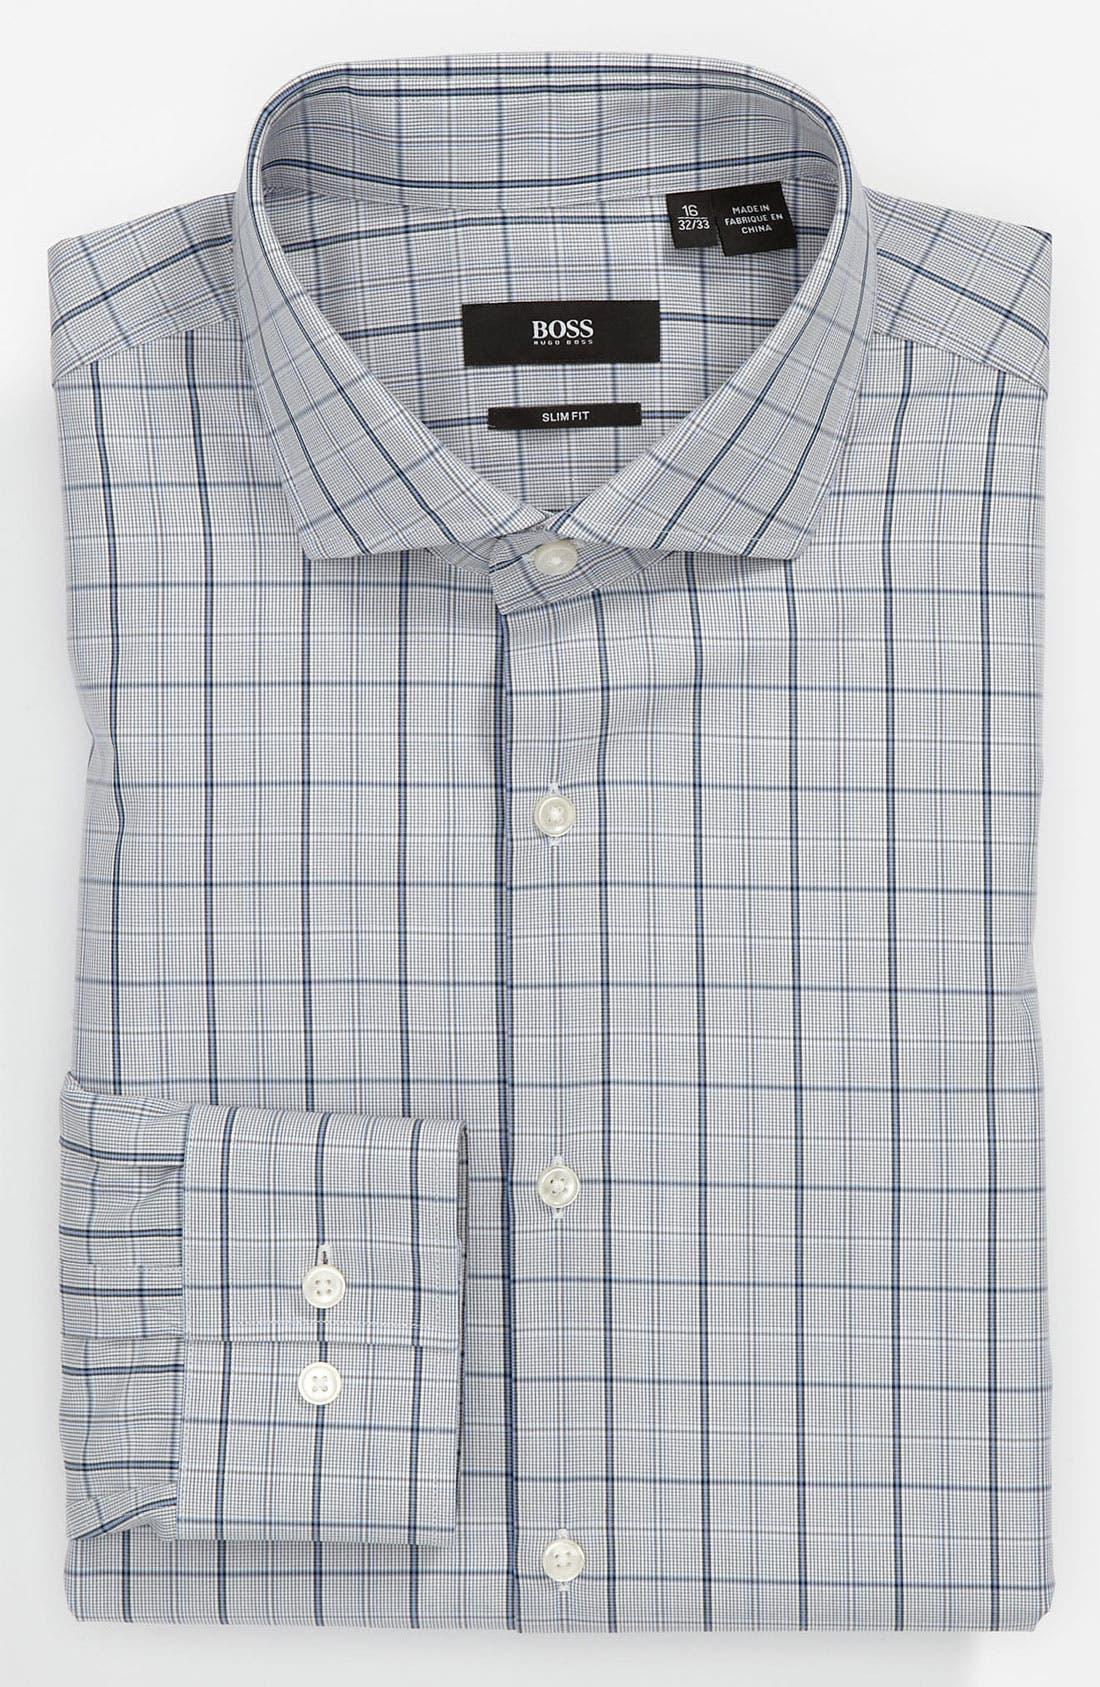 Black Slim Fit Dress Shirt,                             Main thumbnail 1, color,                             Blue